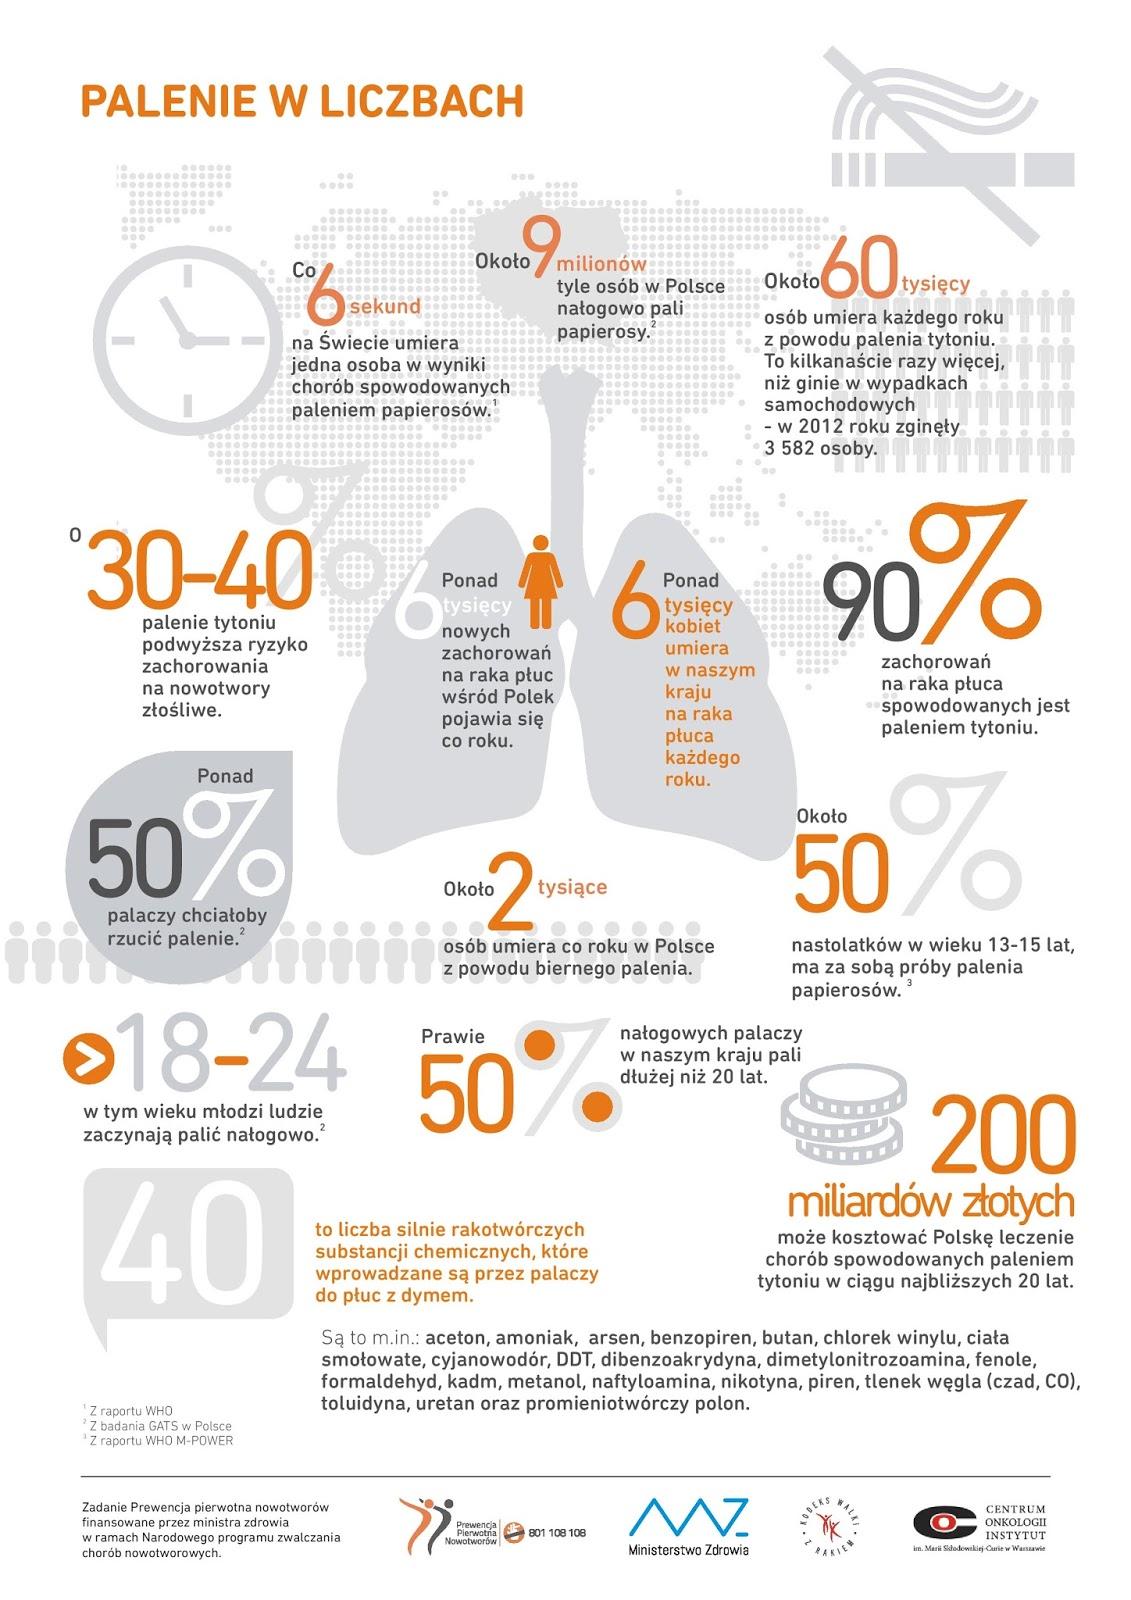 Kodeks walki z rakiem